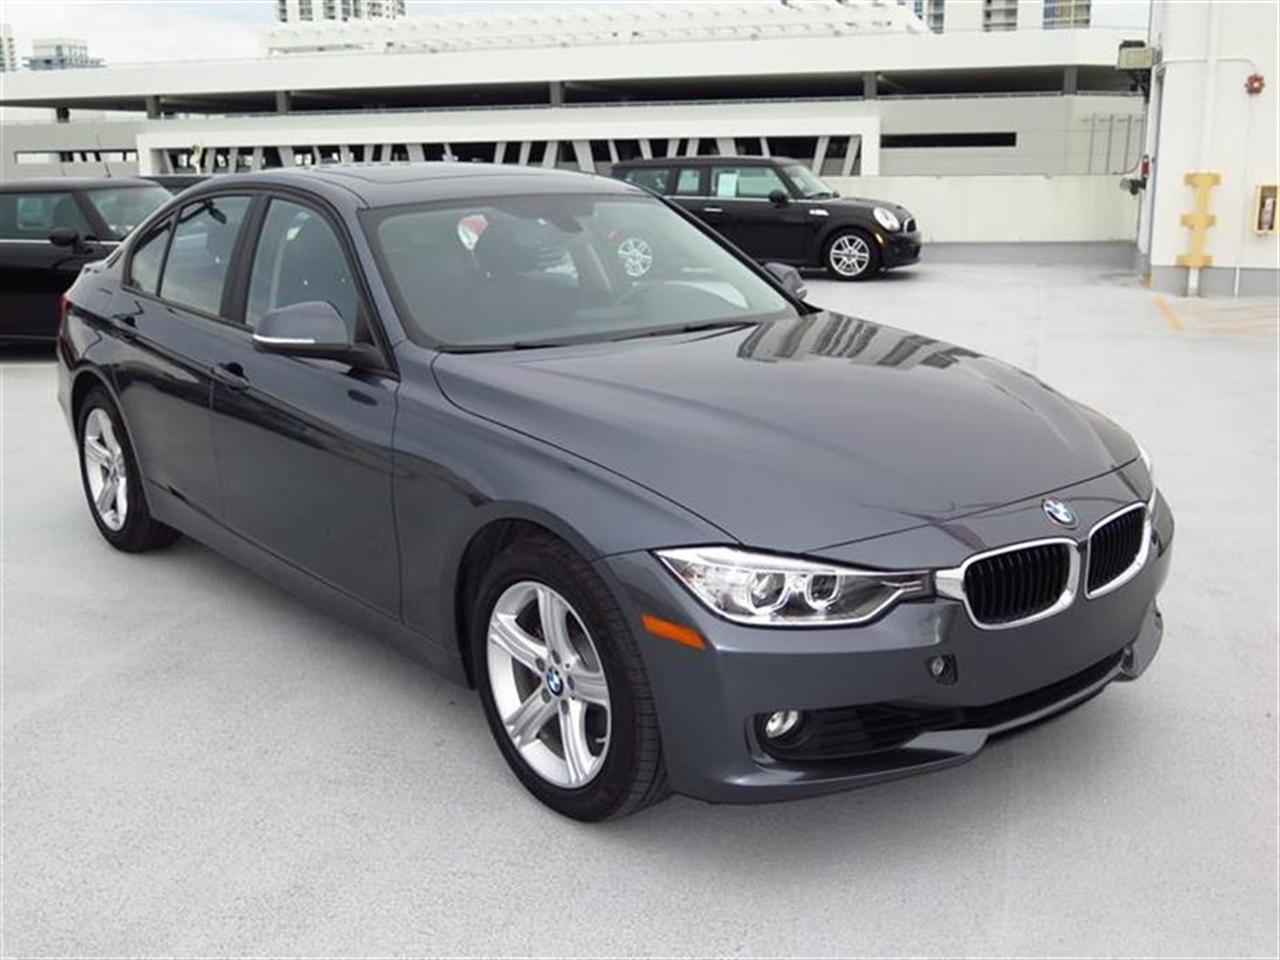 2014 BMW 3 SERIES 4dr Sdn 328i RWD 8773 miles 2 Seatback Storage Pockets 4 12V DC Power Outlets